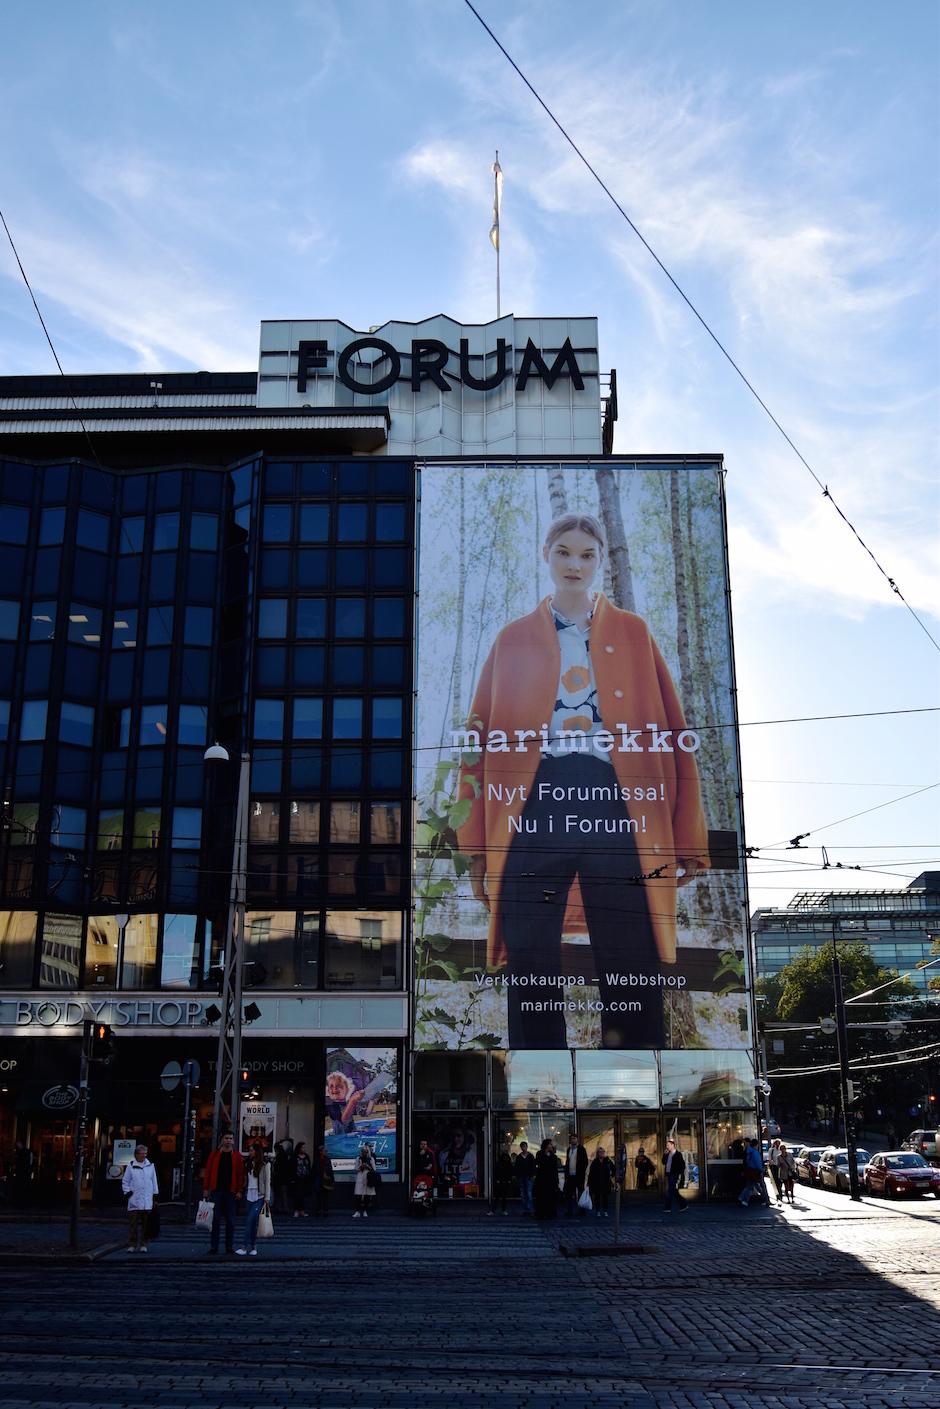 Kauppakeskus Forum Marimekko Helsinki DSC_0392